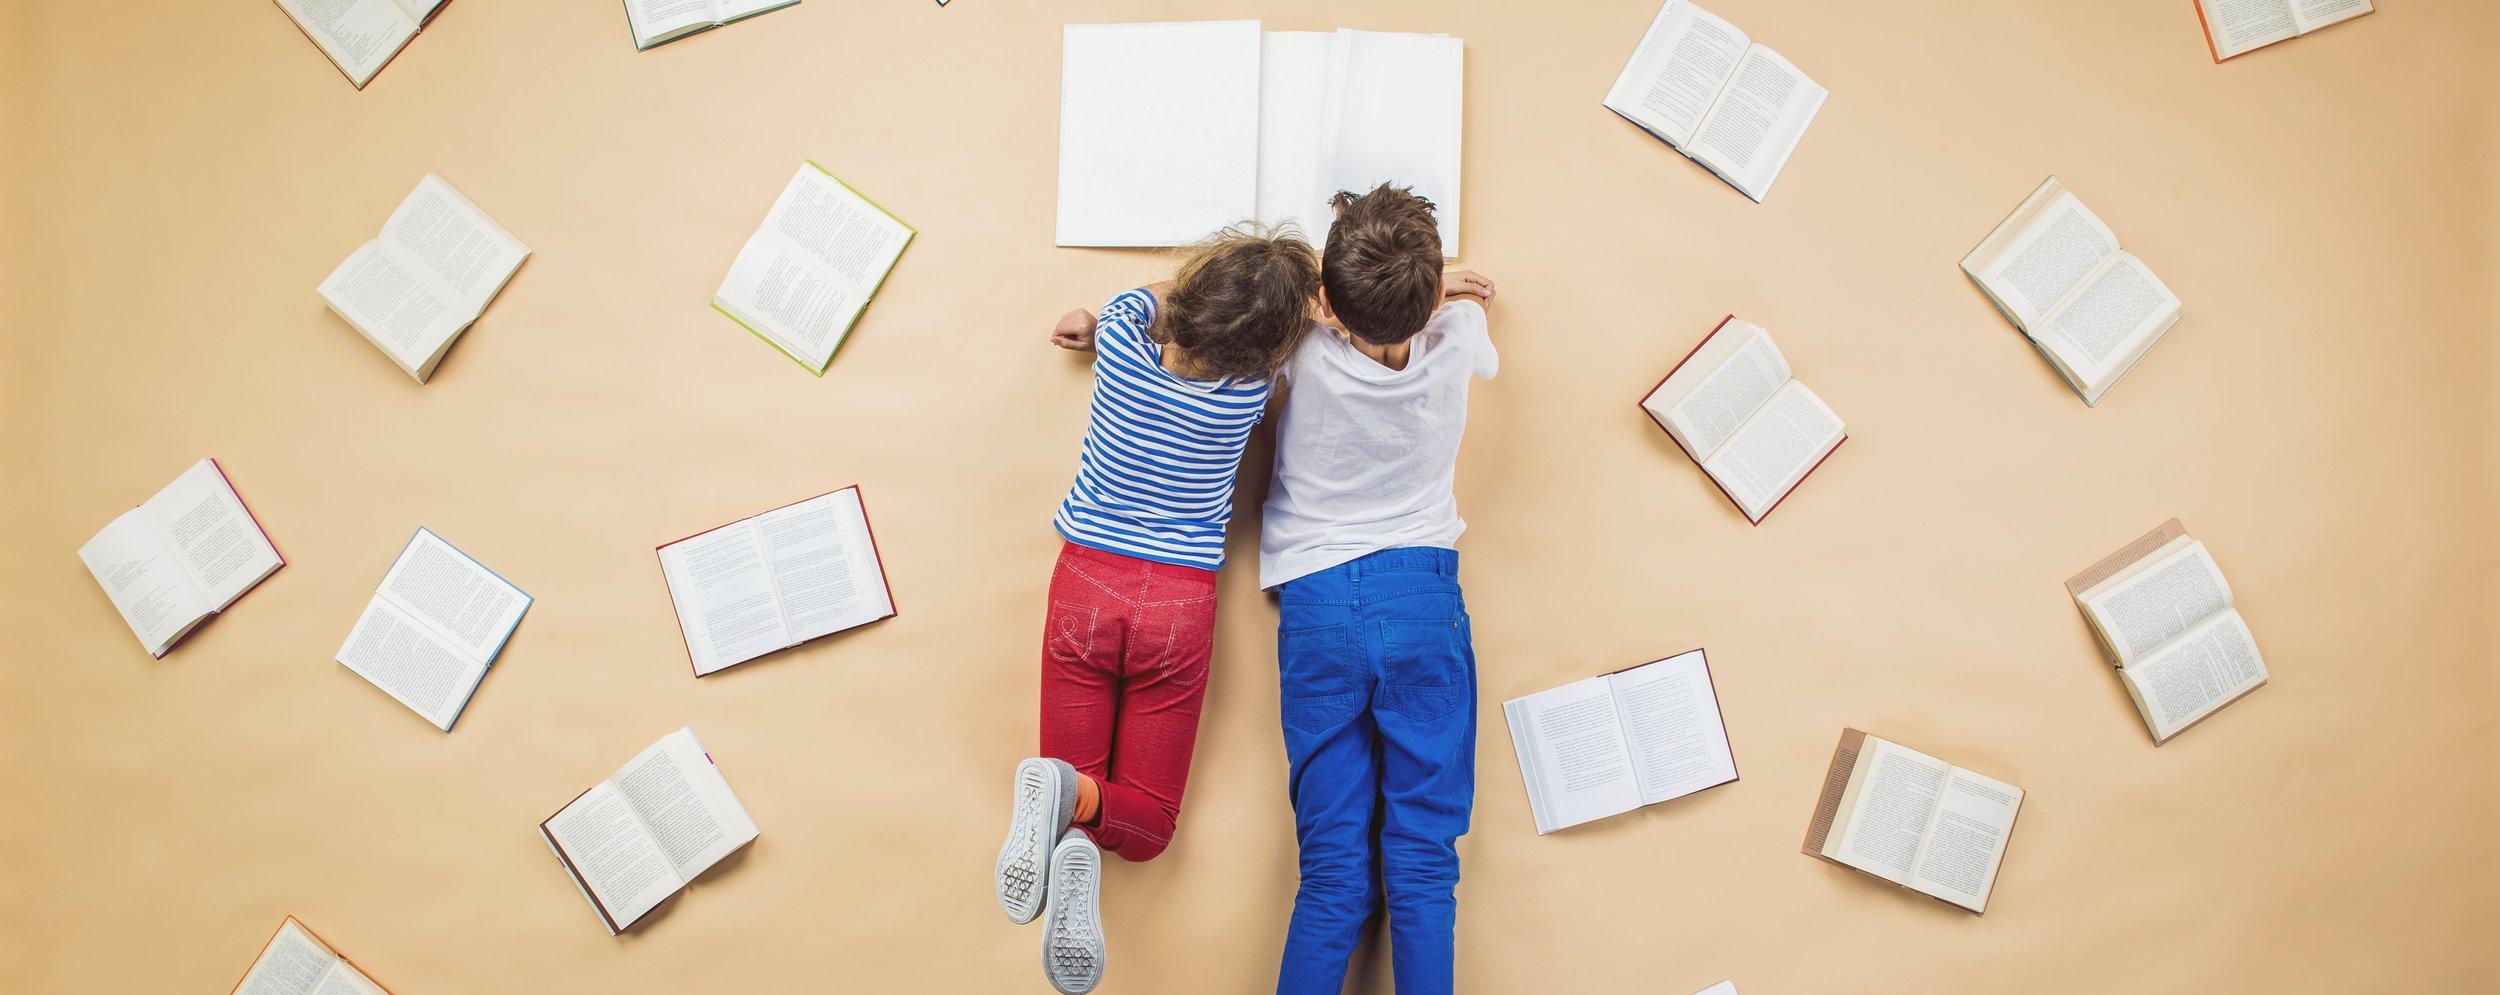 graphicstock-happy-children-are-reading-book-on-the-floor-with-group-of-books-around-them_SAmDFJ2-Z.jpg